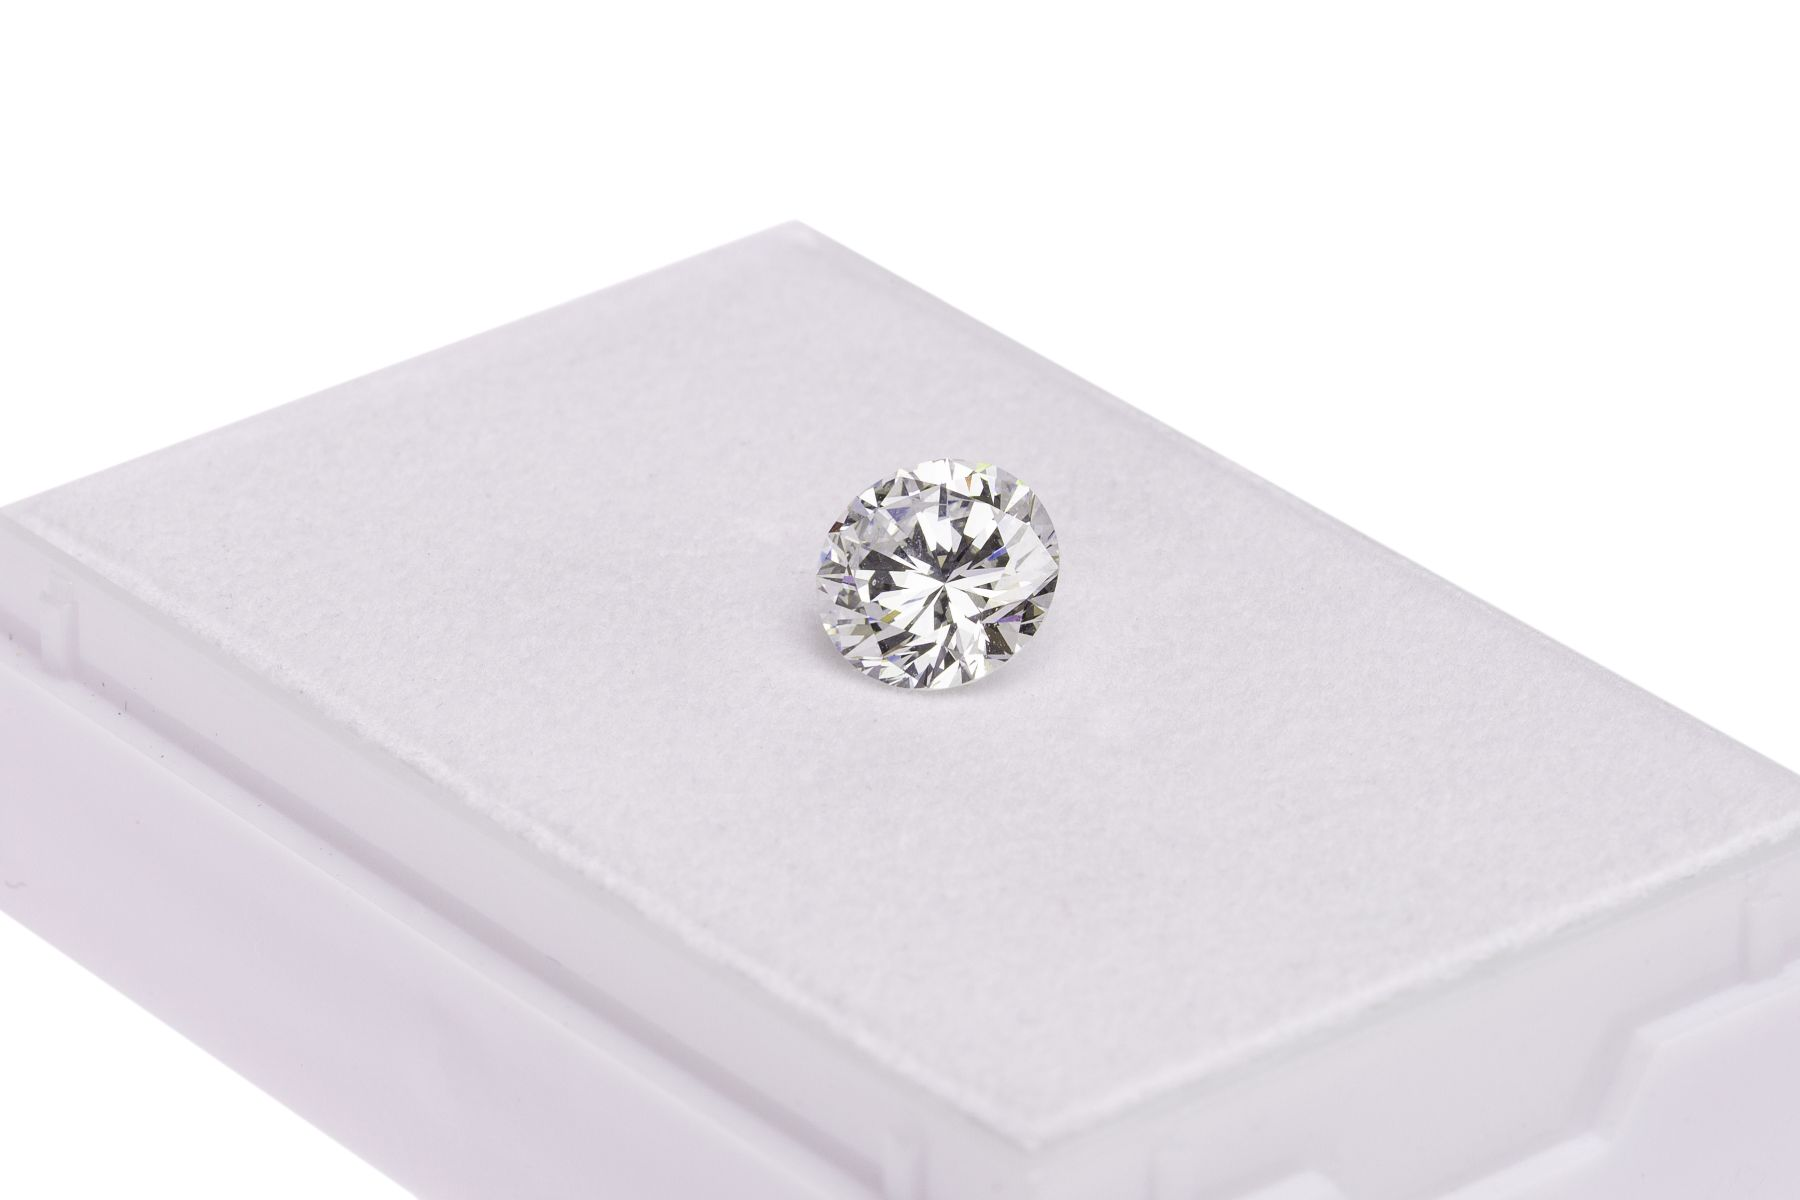 #217 Diamond | Diamant Image